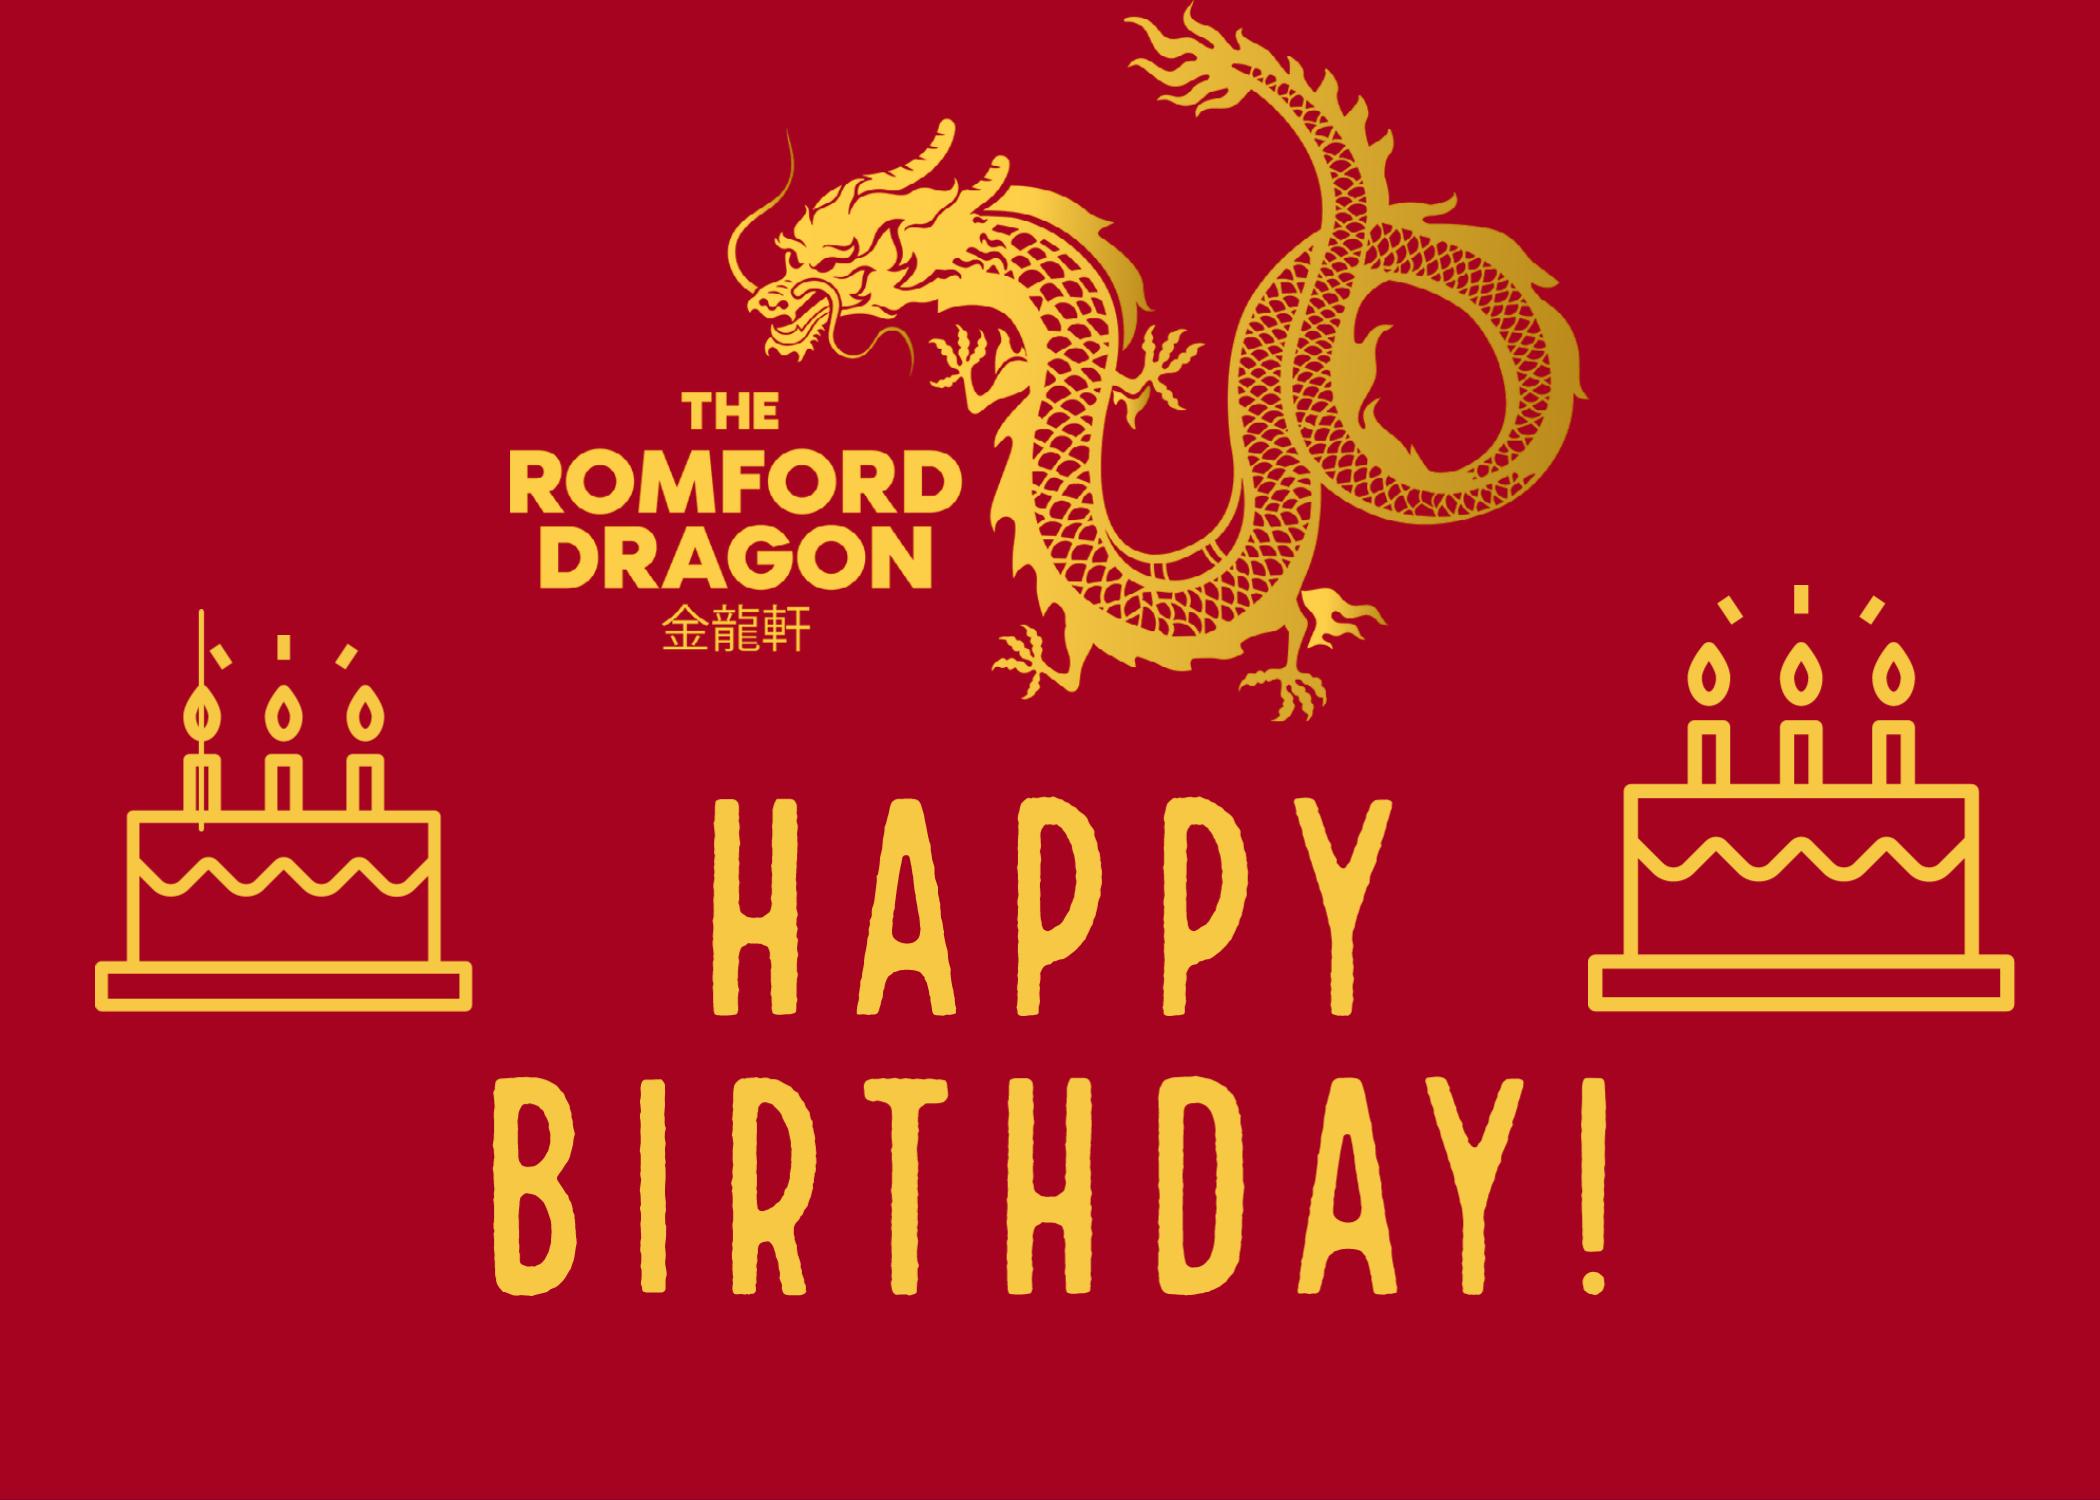 happy birthday romford dragon graphic with birthday cakes